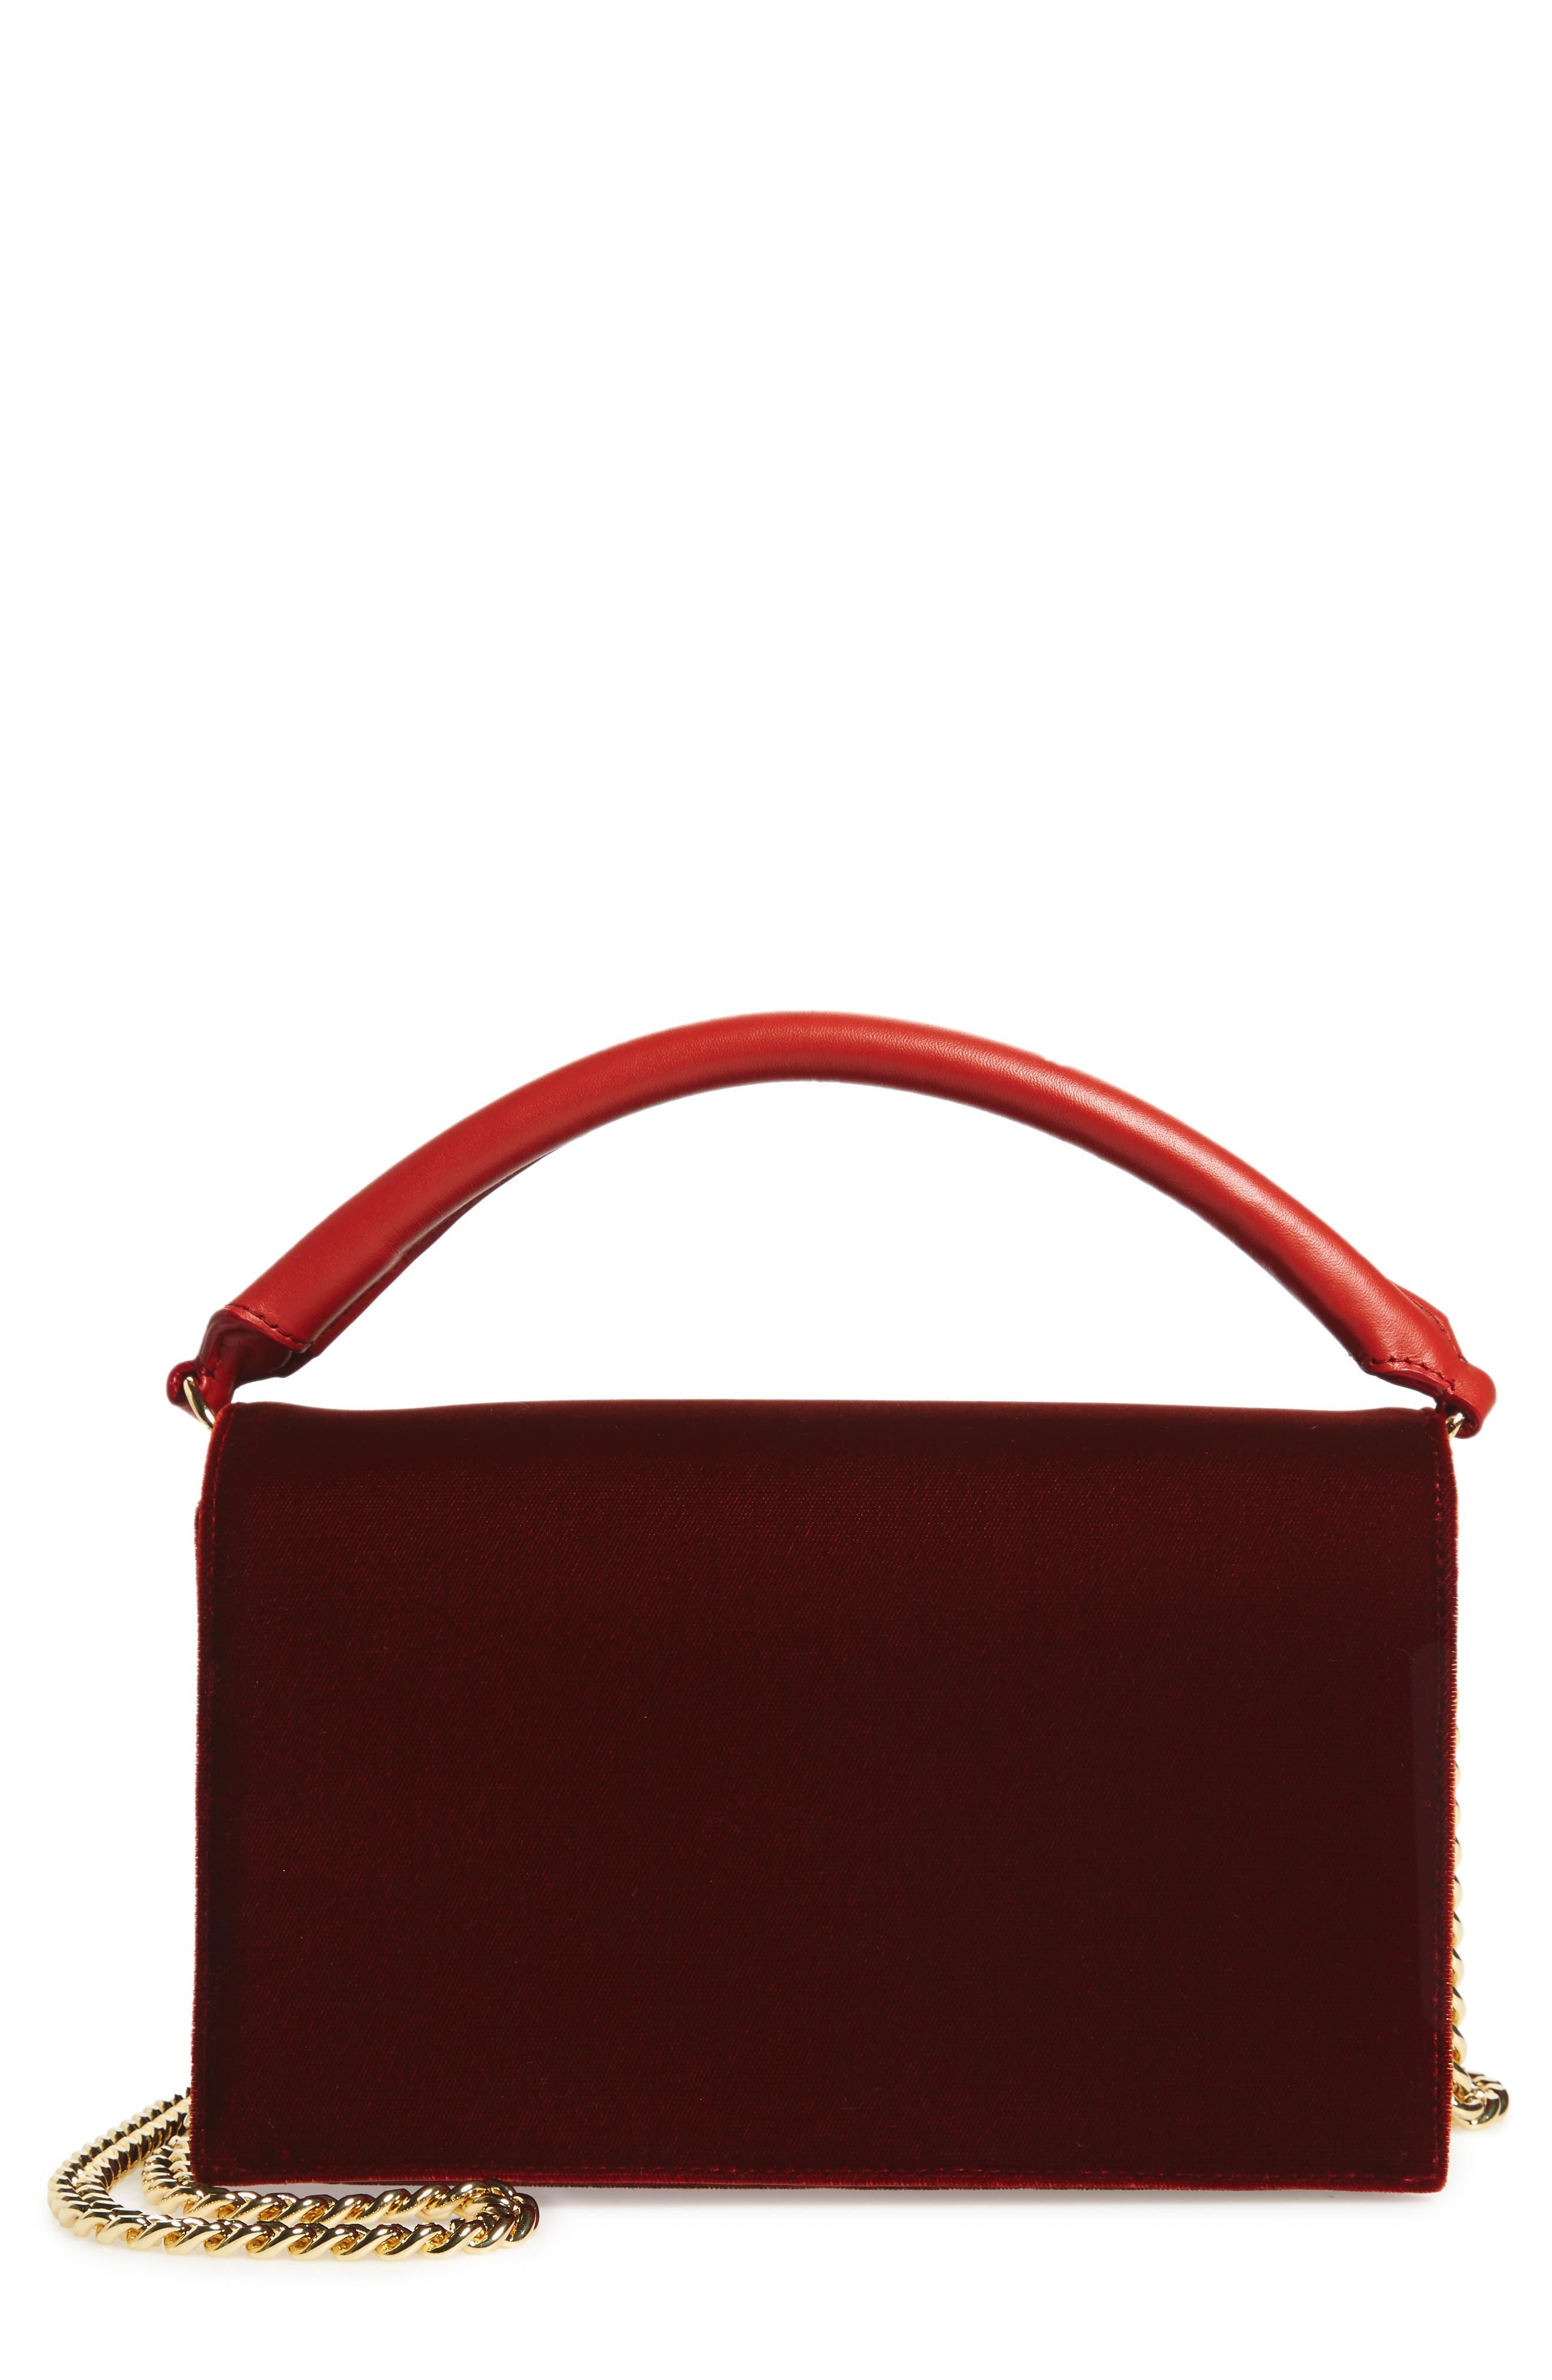 Diane von Furstenberg Soirée Velvet Top Handle Bag